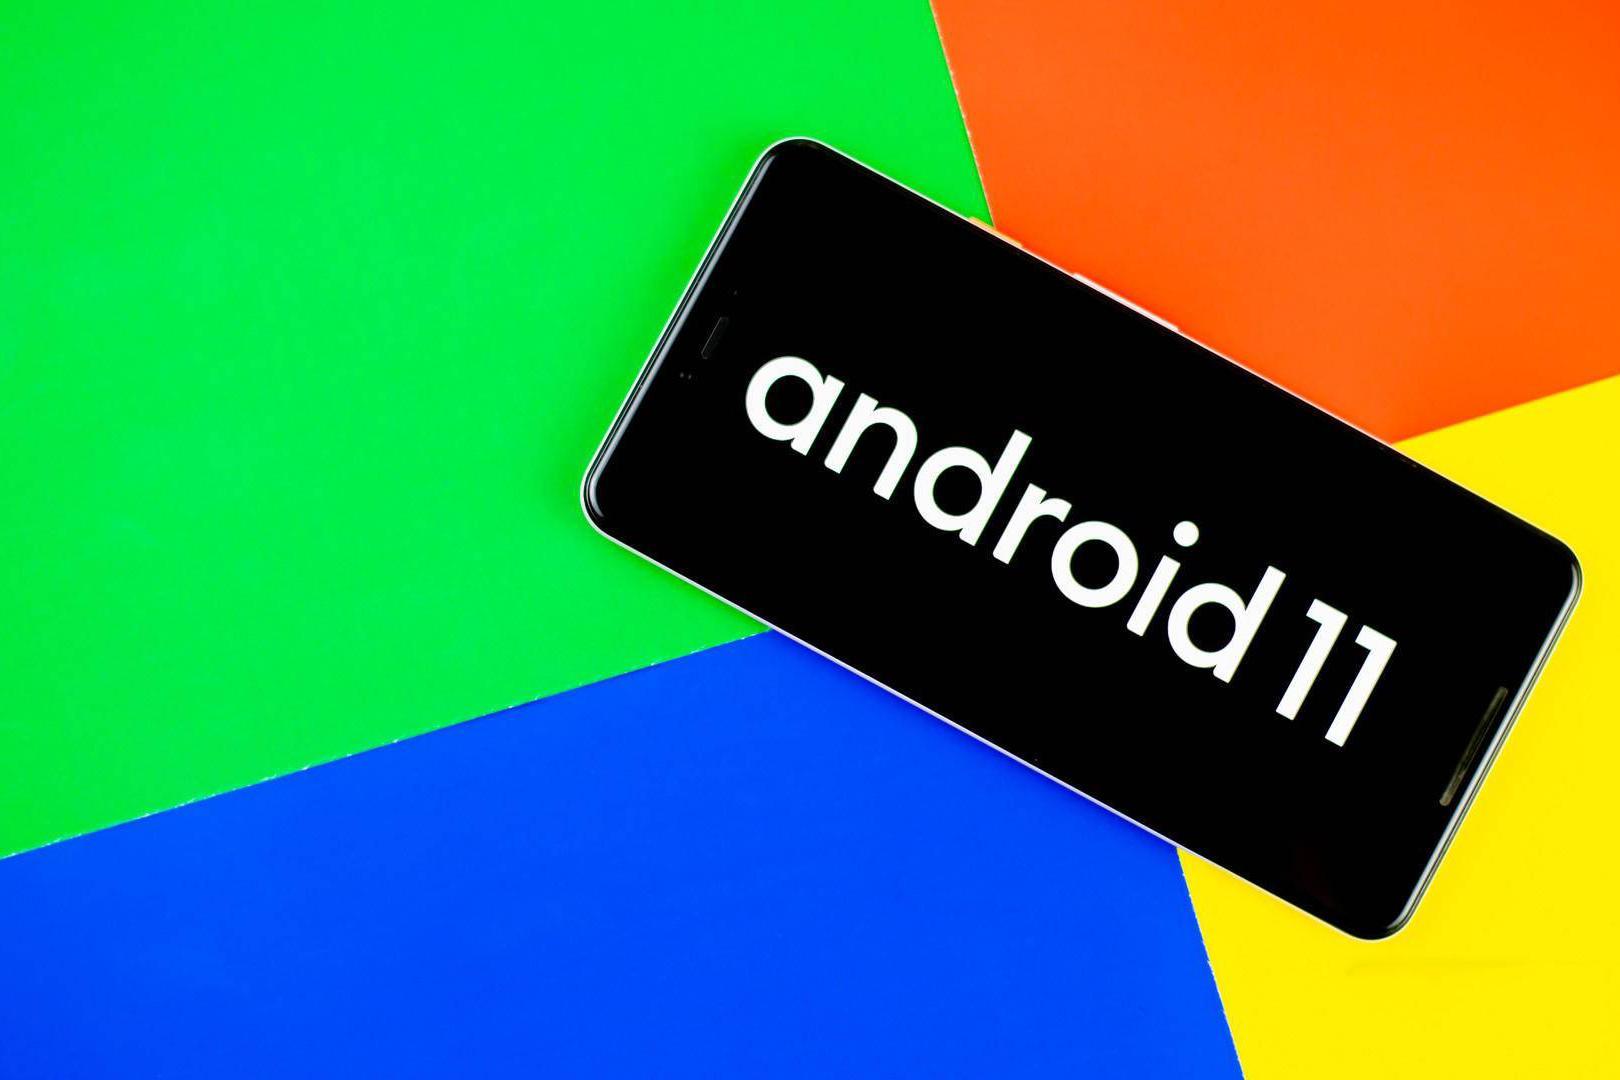 Android系统发展历史:当今最大移动操作系统是如何演变的